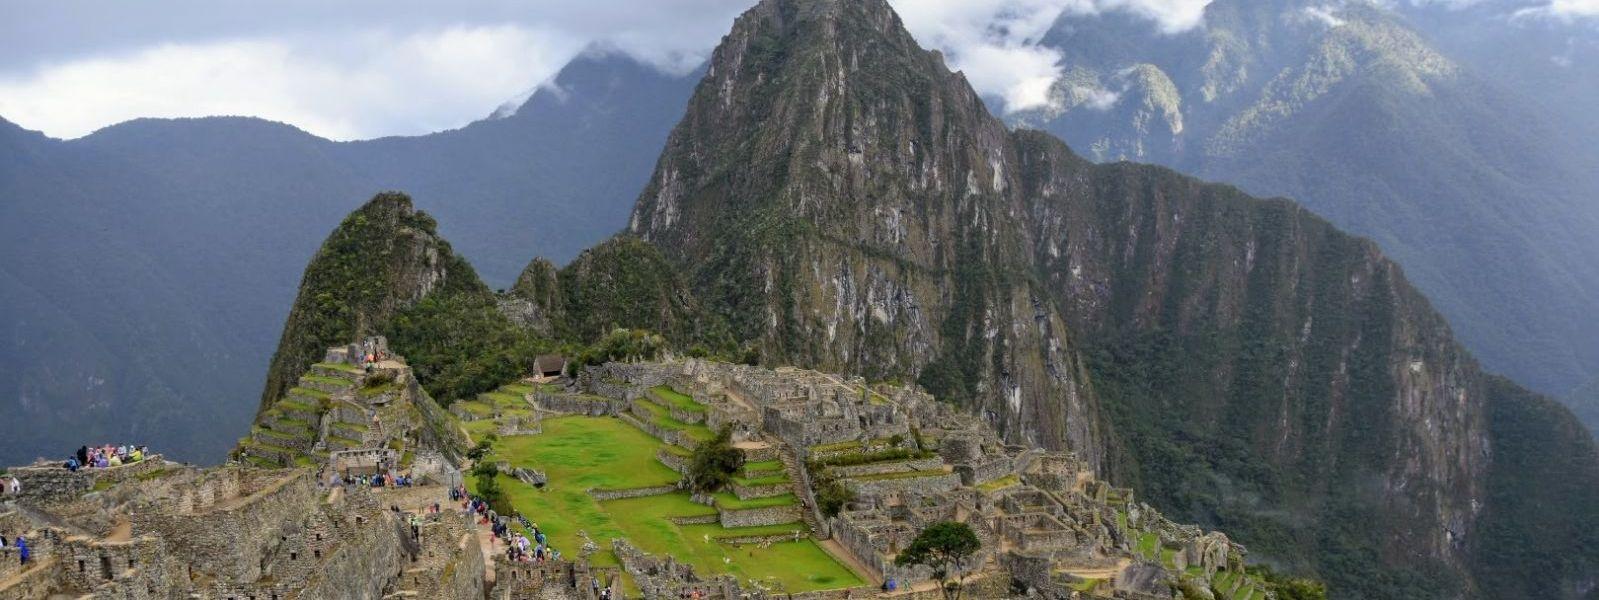 Cusco: Hiking the Inca Trail and Rainbow Mountain